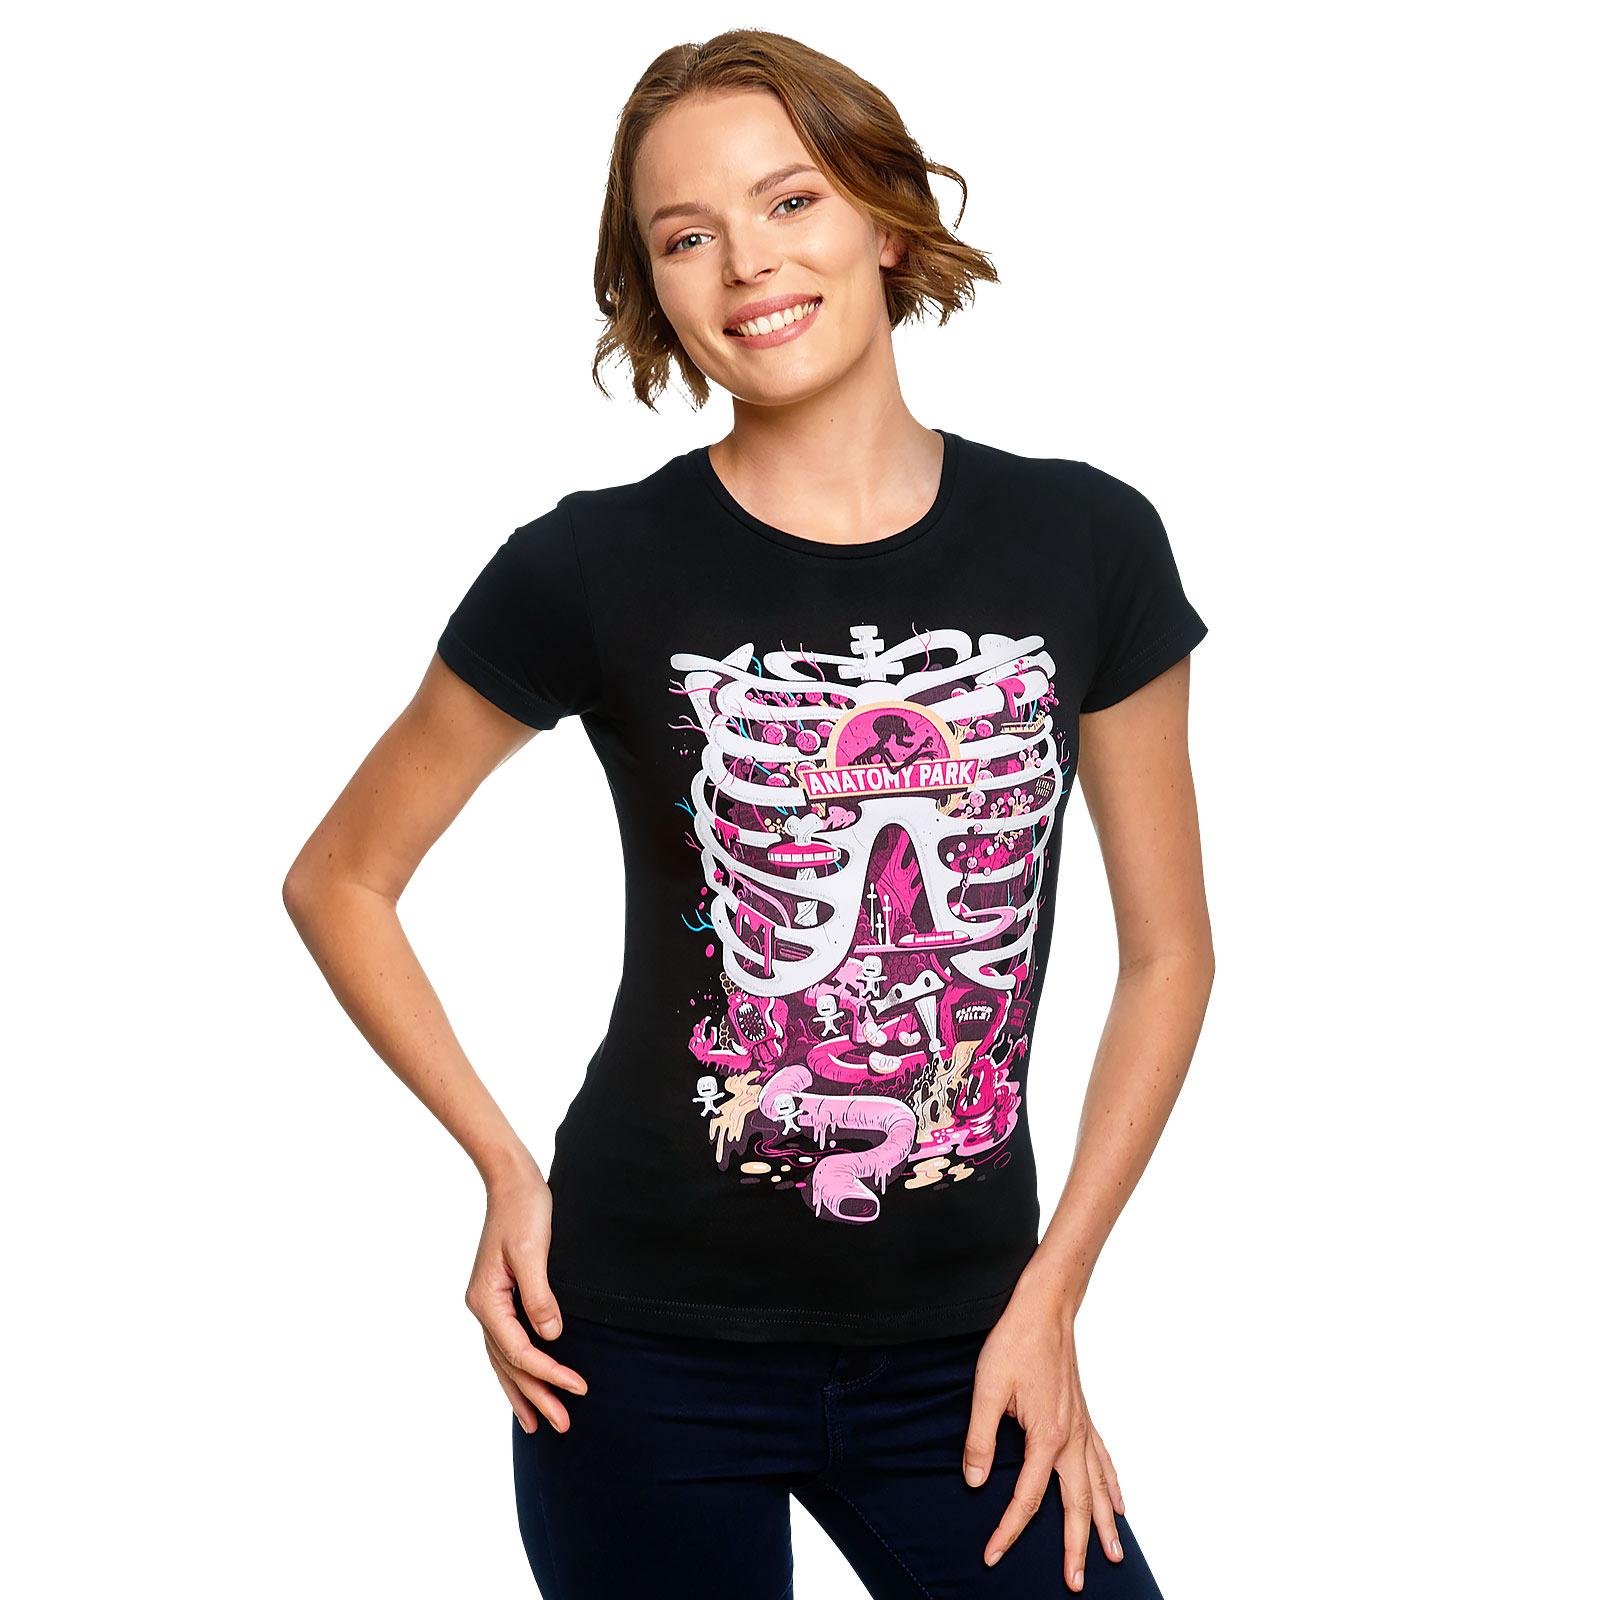 Rick and Morty - Anatomy Park T-Shirt Damen schwarz